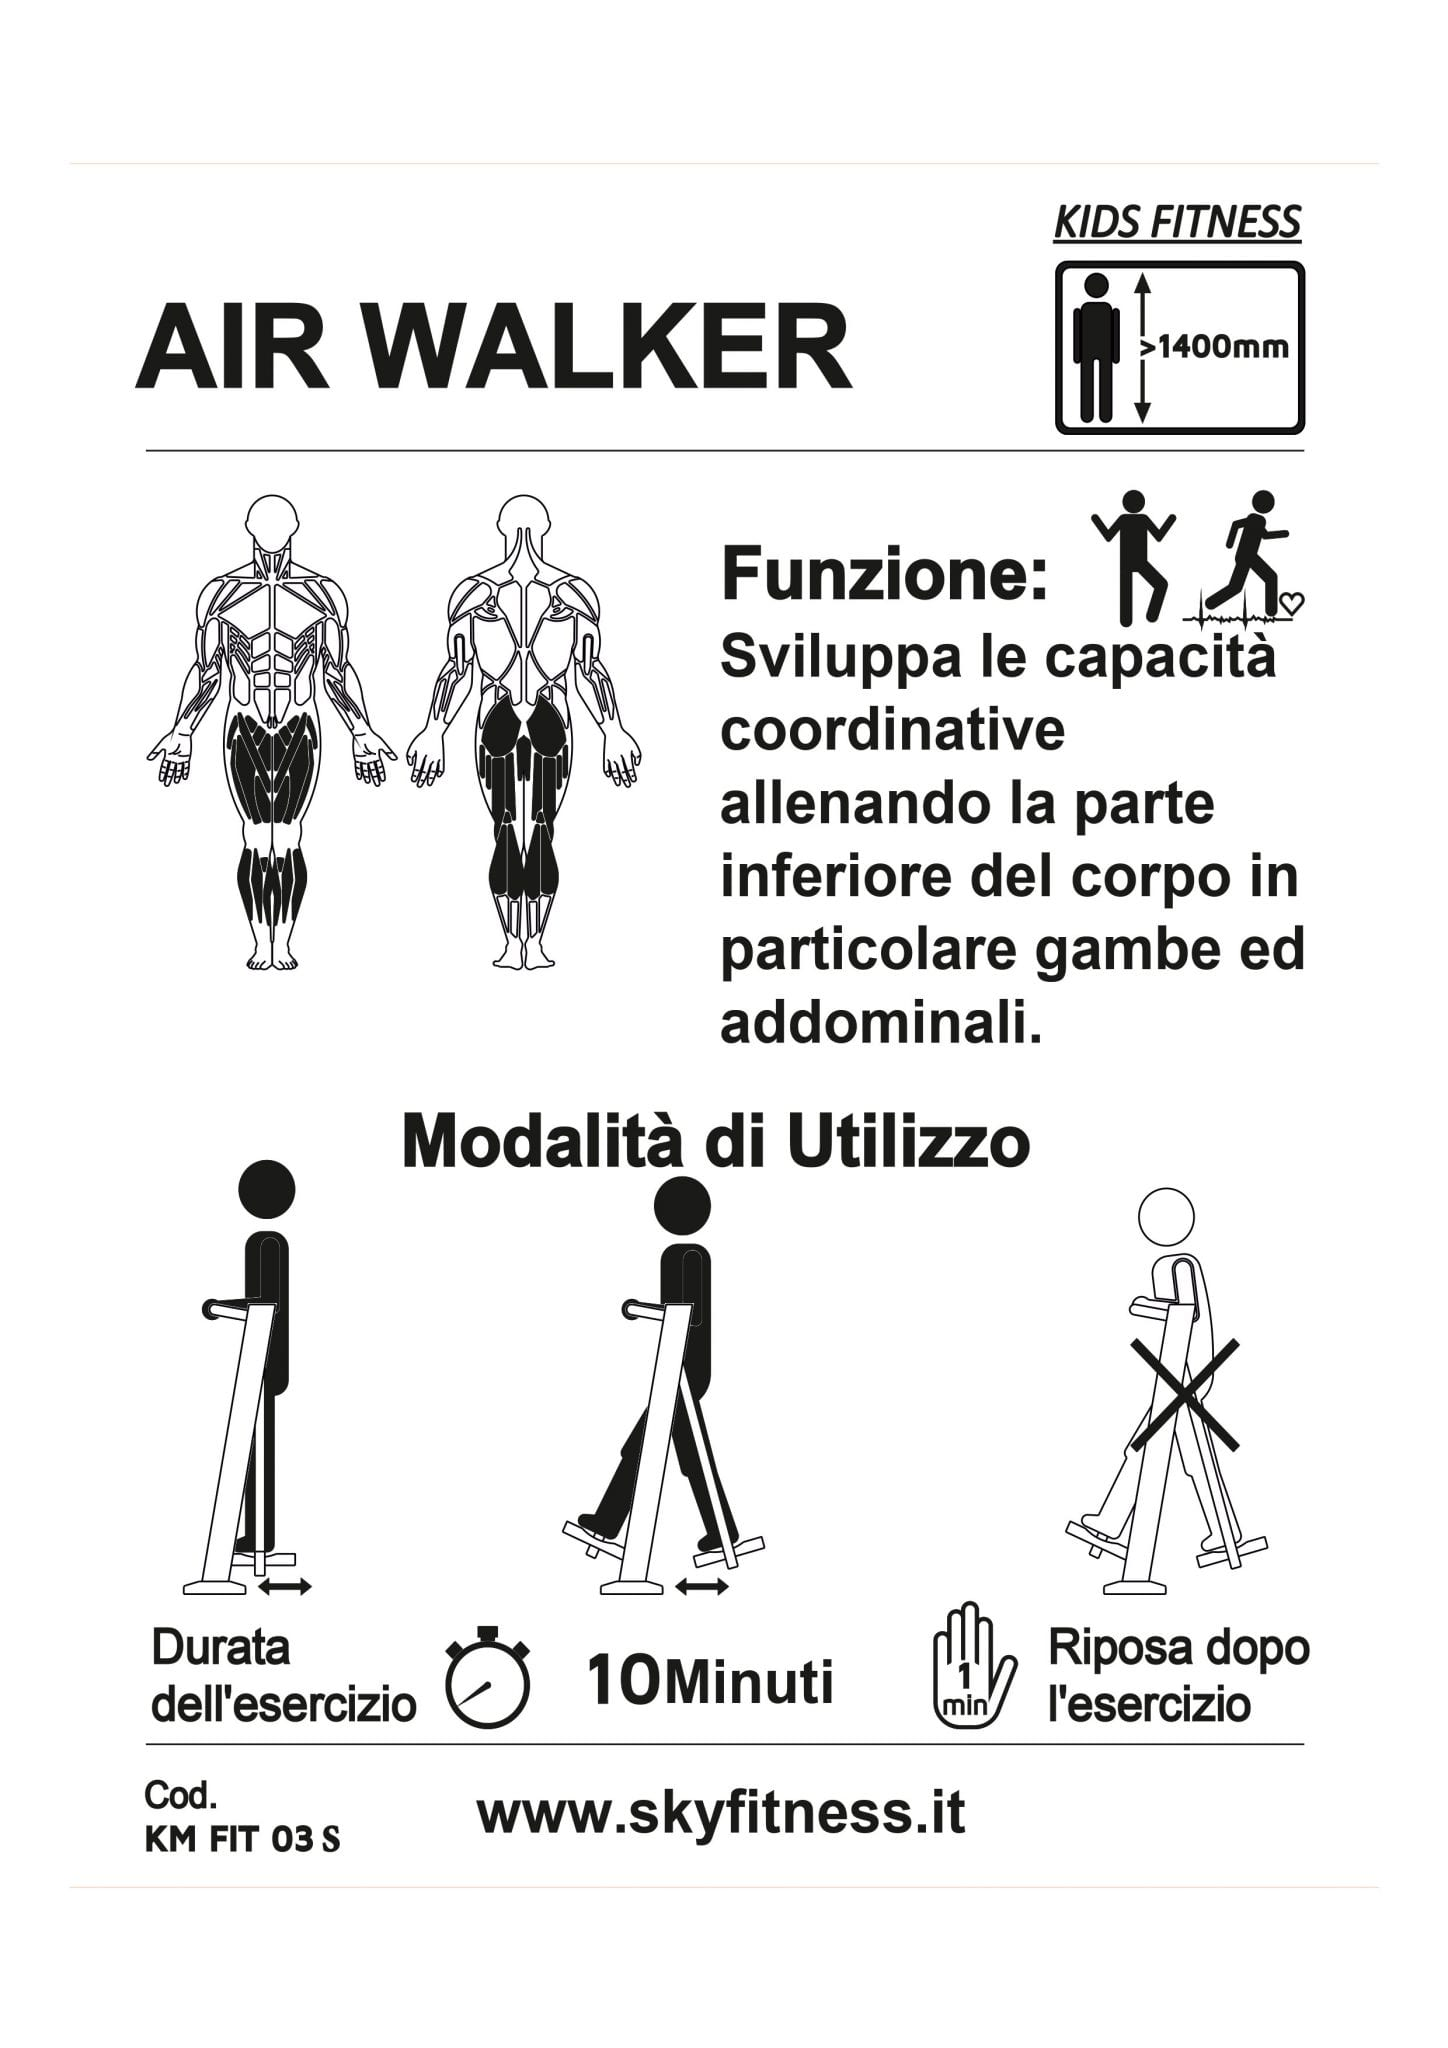 AIR WALKER KM FIT 03 S